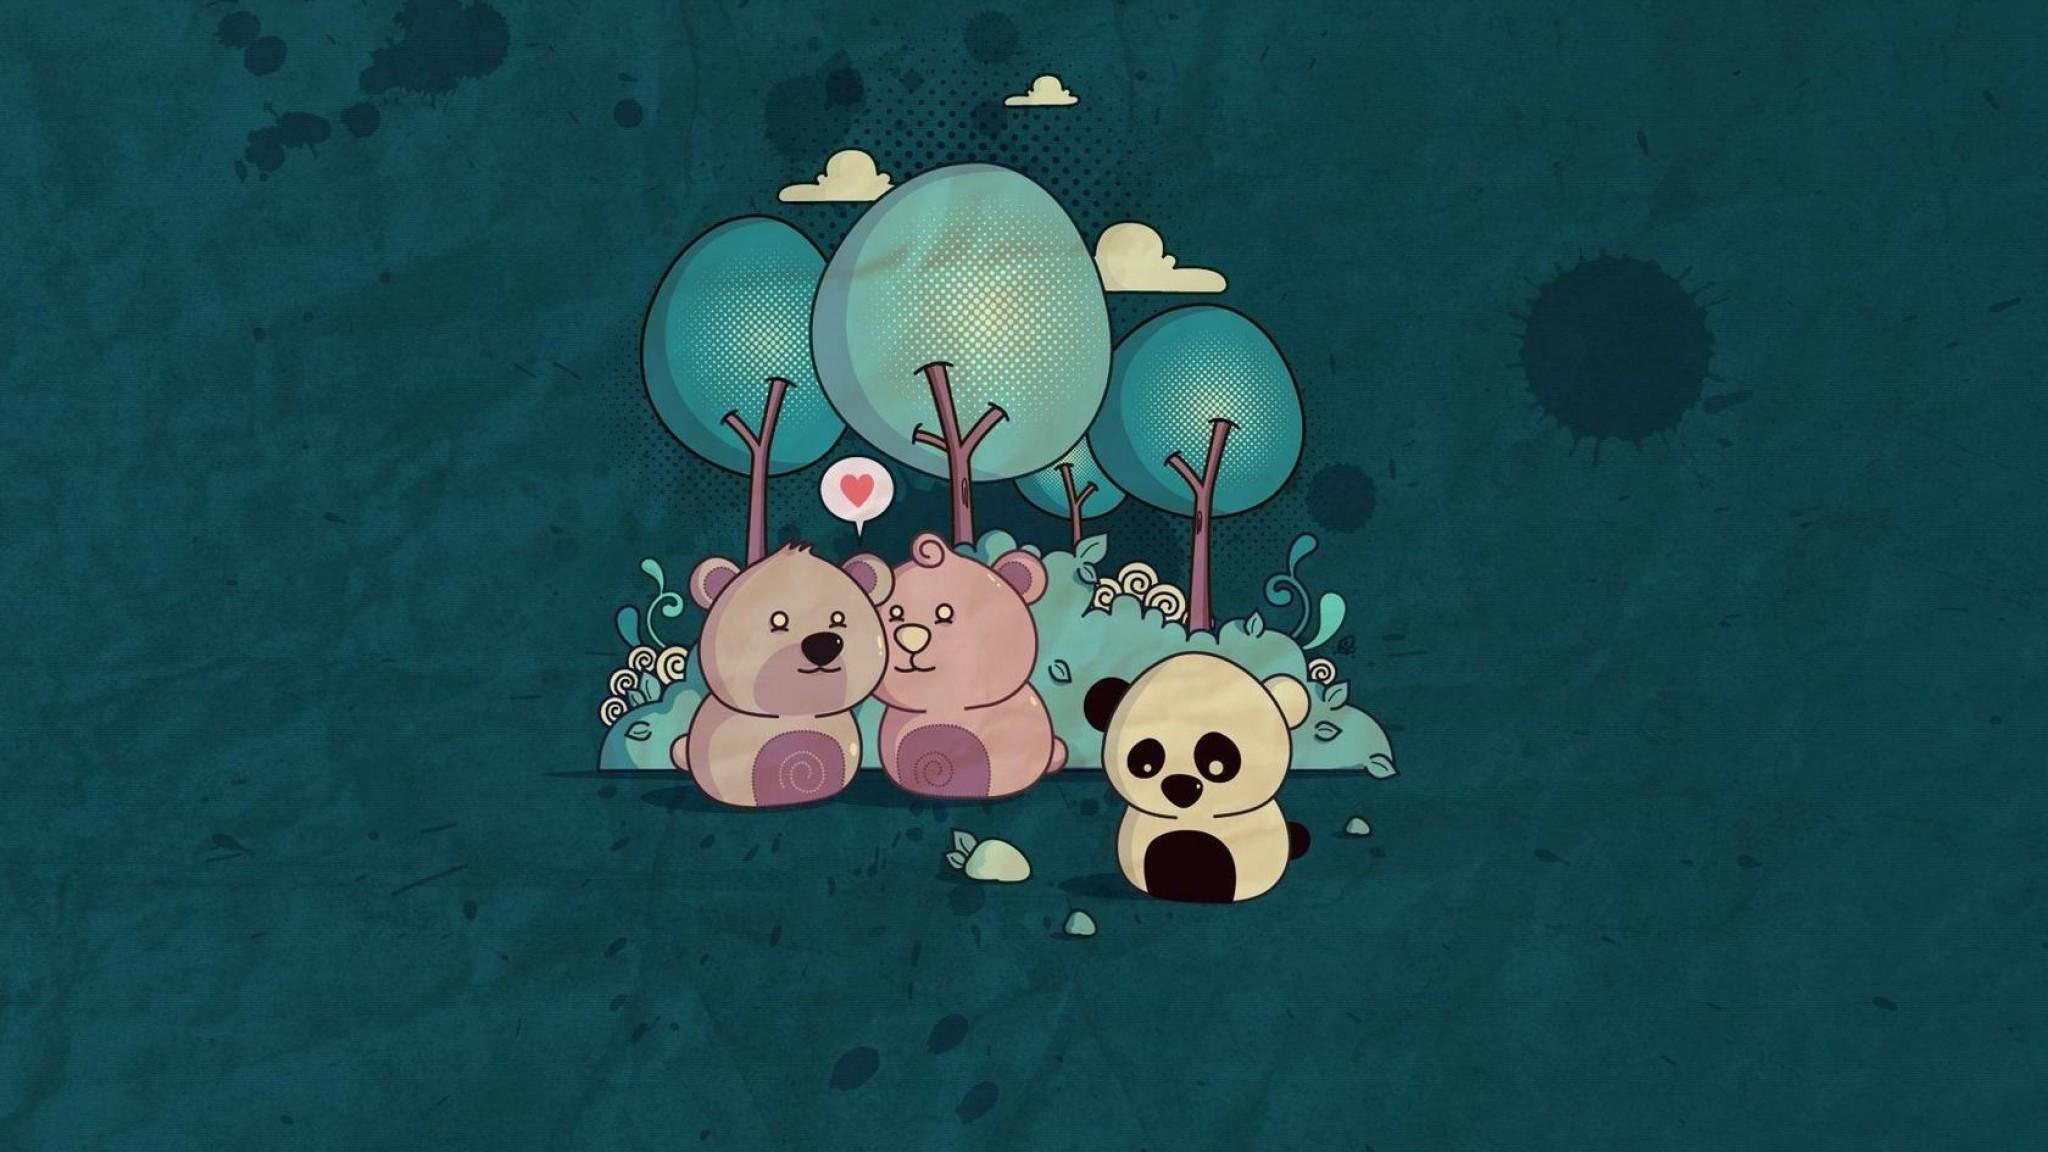 Anime Panda Wallpaper High Quality